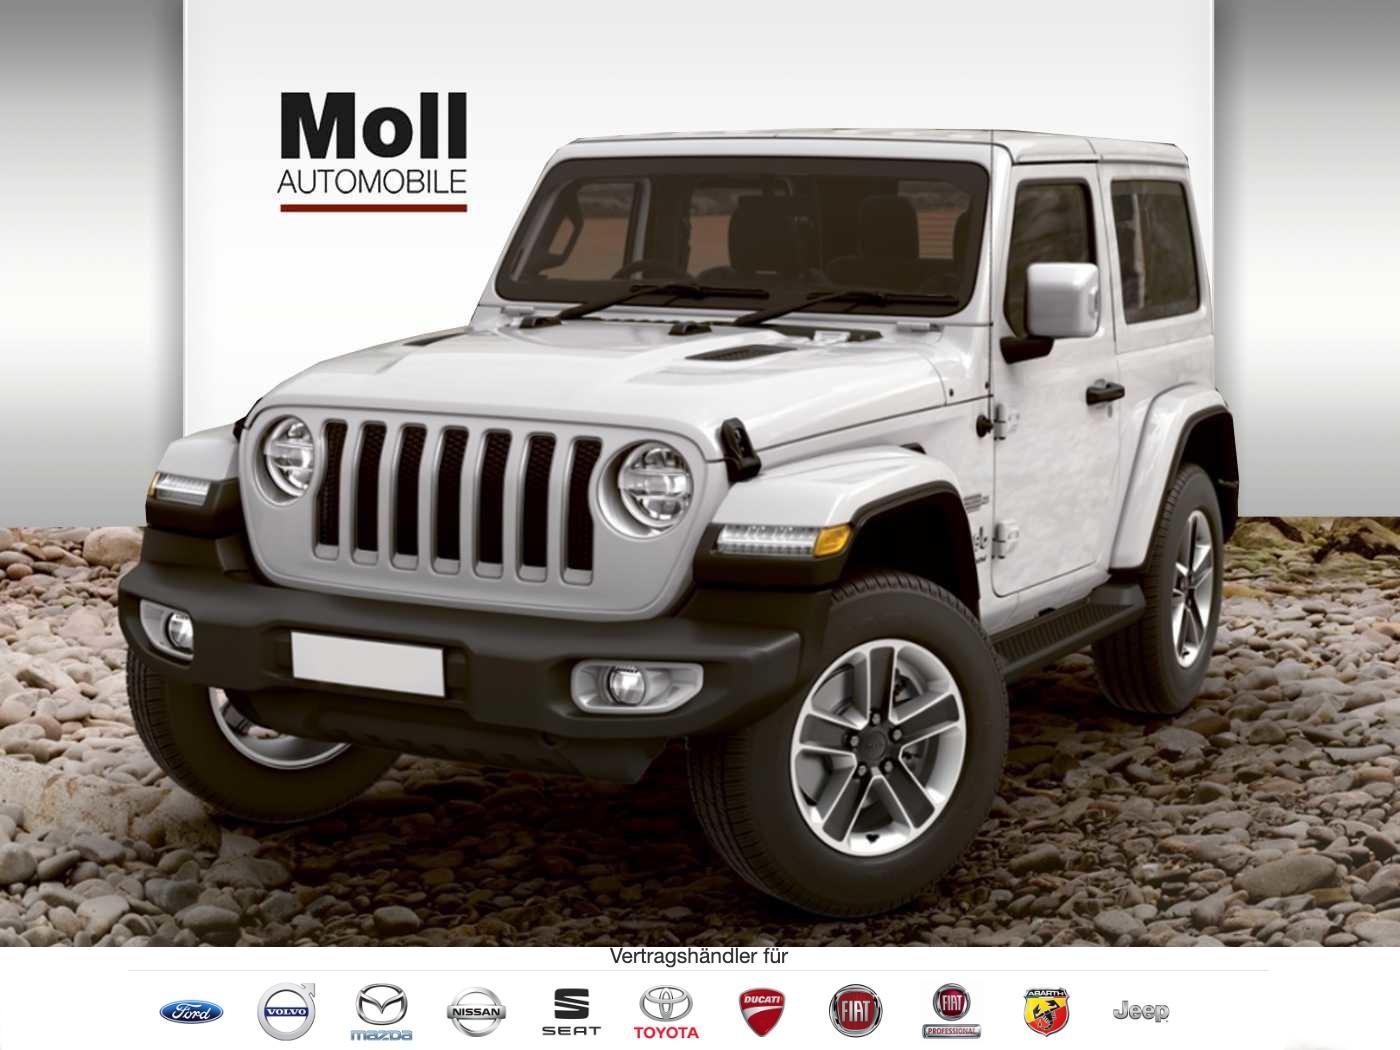 Jeep Wrangler JL MY18 Sahara 2.2l CRDI Wrangler Sahara 2.2 CRDI NEW TECH NAVI SHZ, Jahr 2019, Diesel